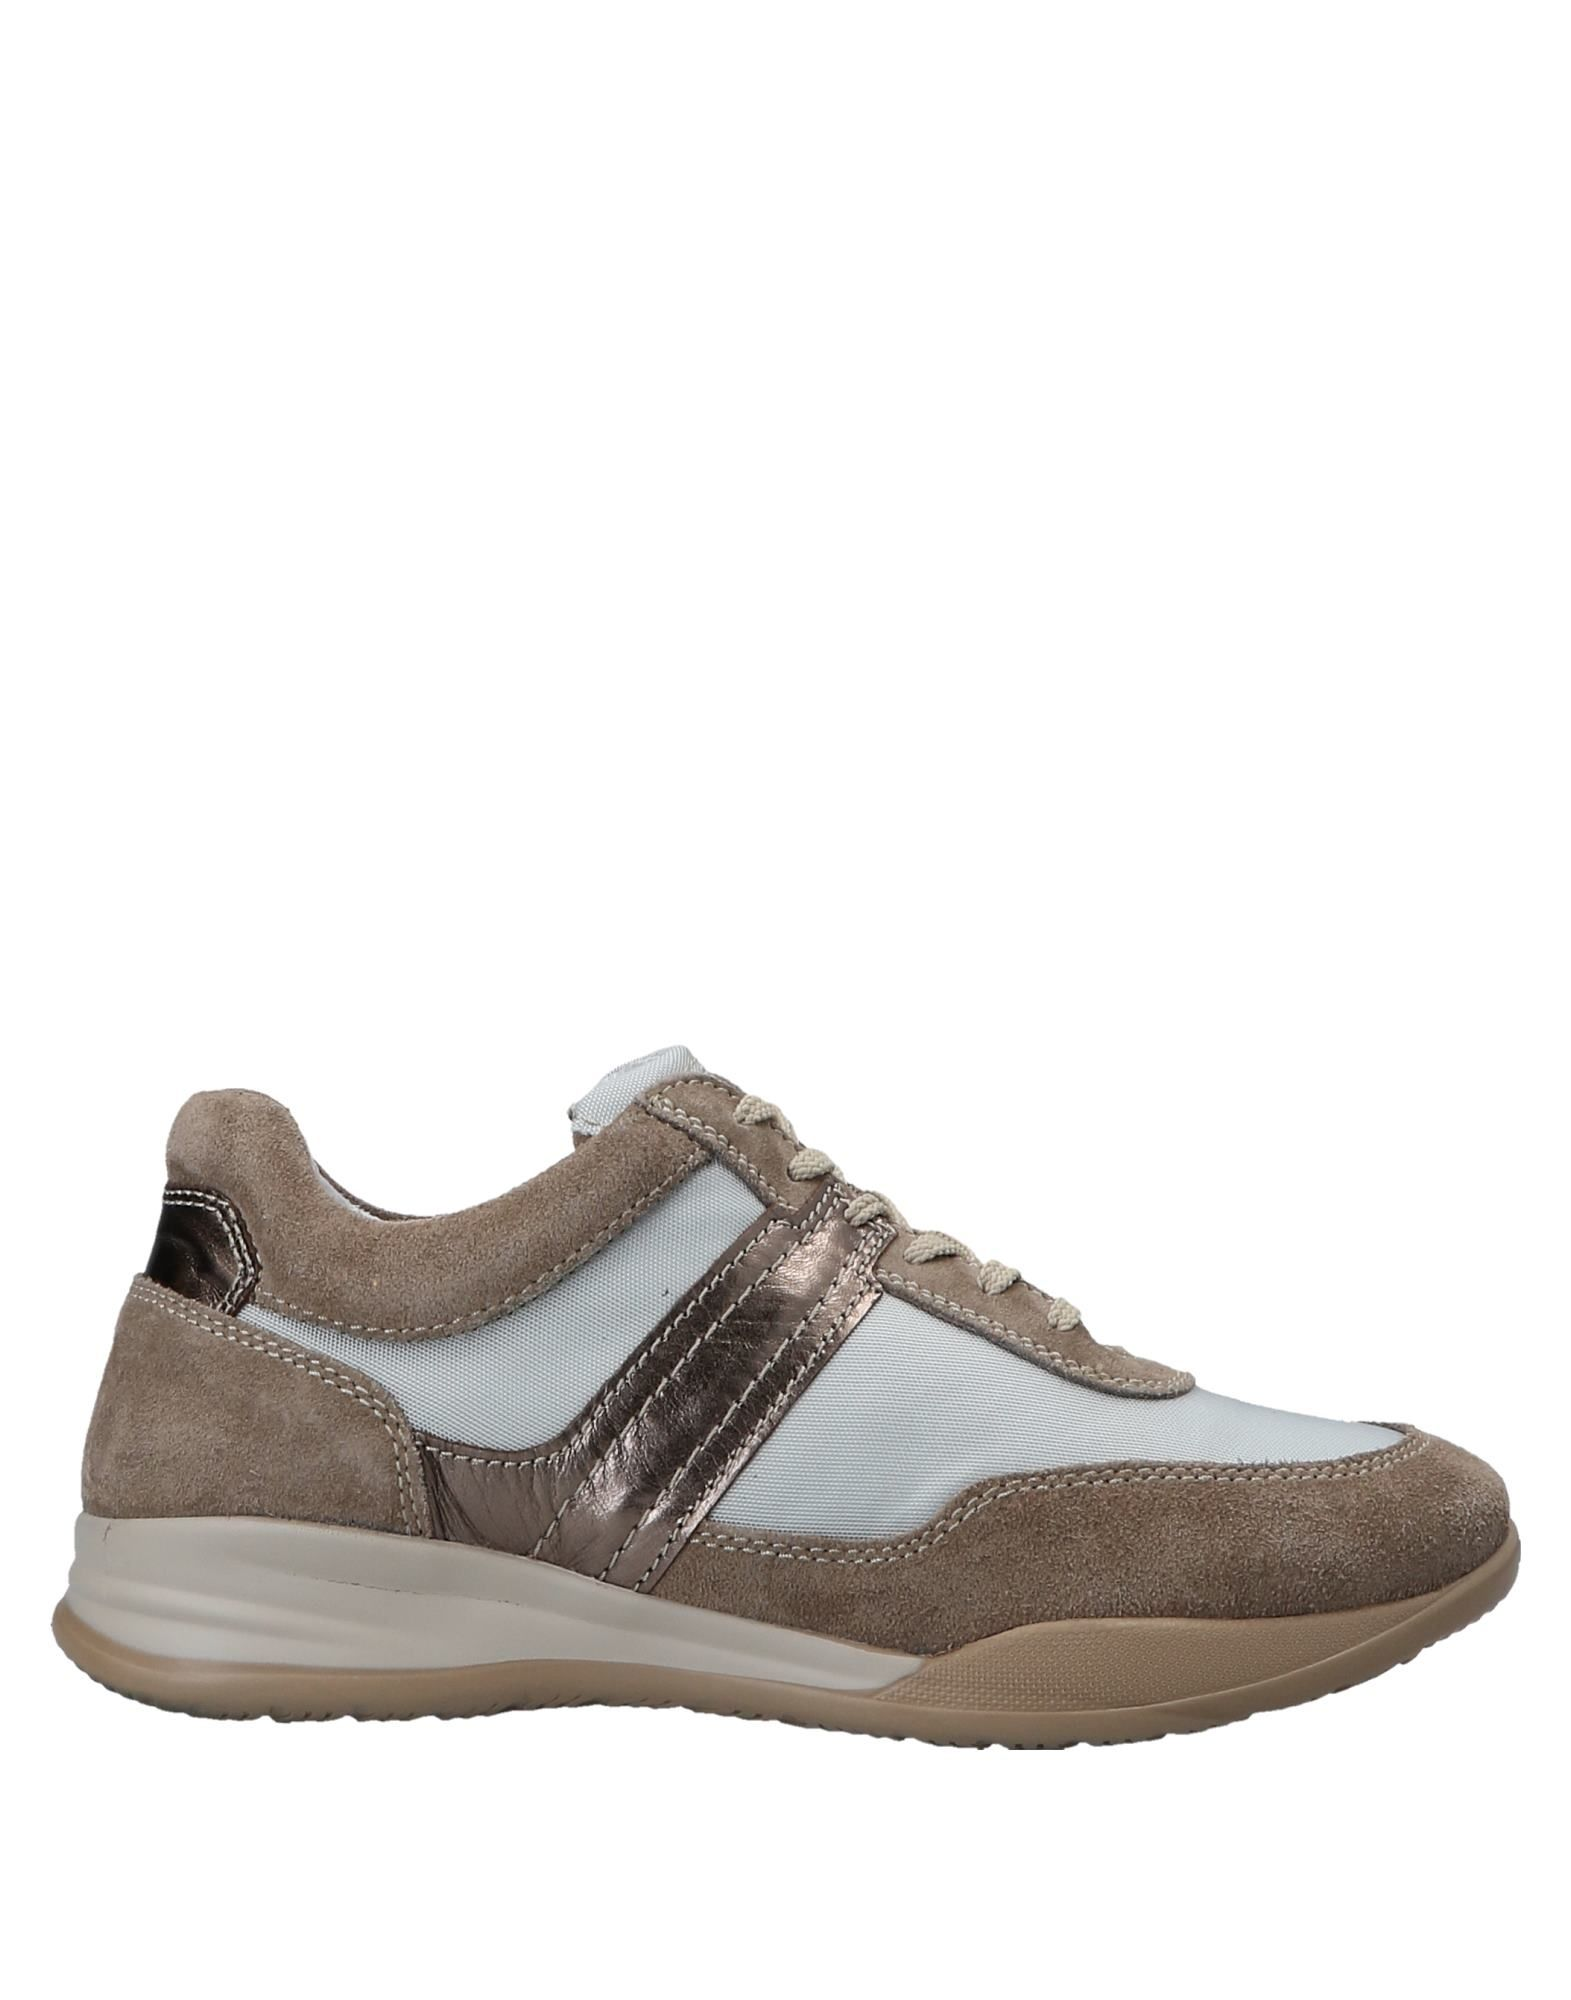 Valleverde on Sneakers - Women Valleverde Sneakers online on Valleverde  Australia - 11552968BG 3f741d